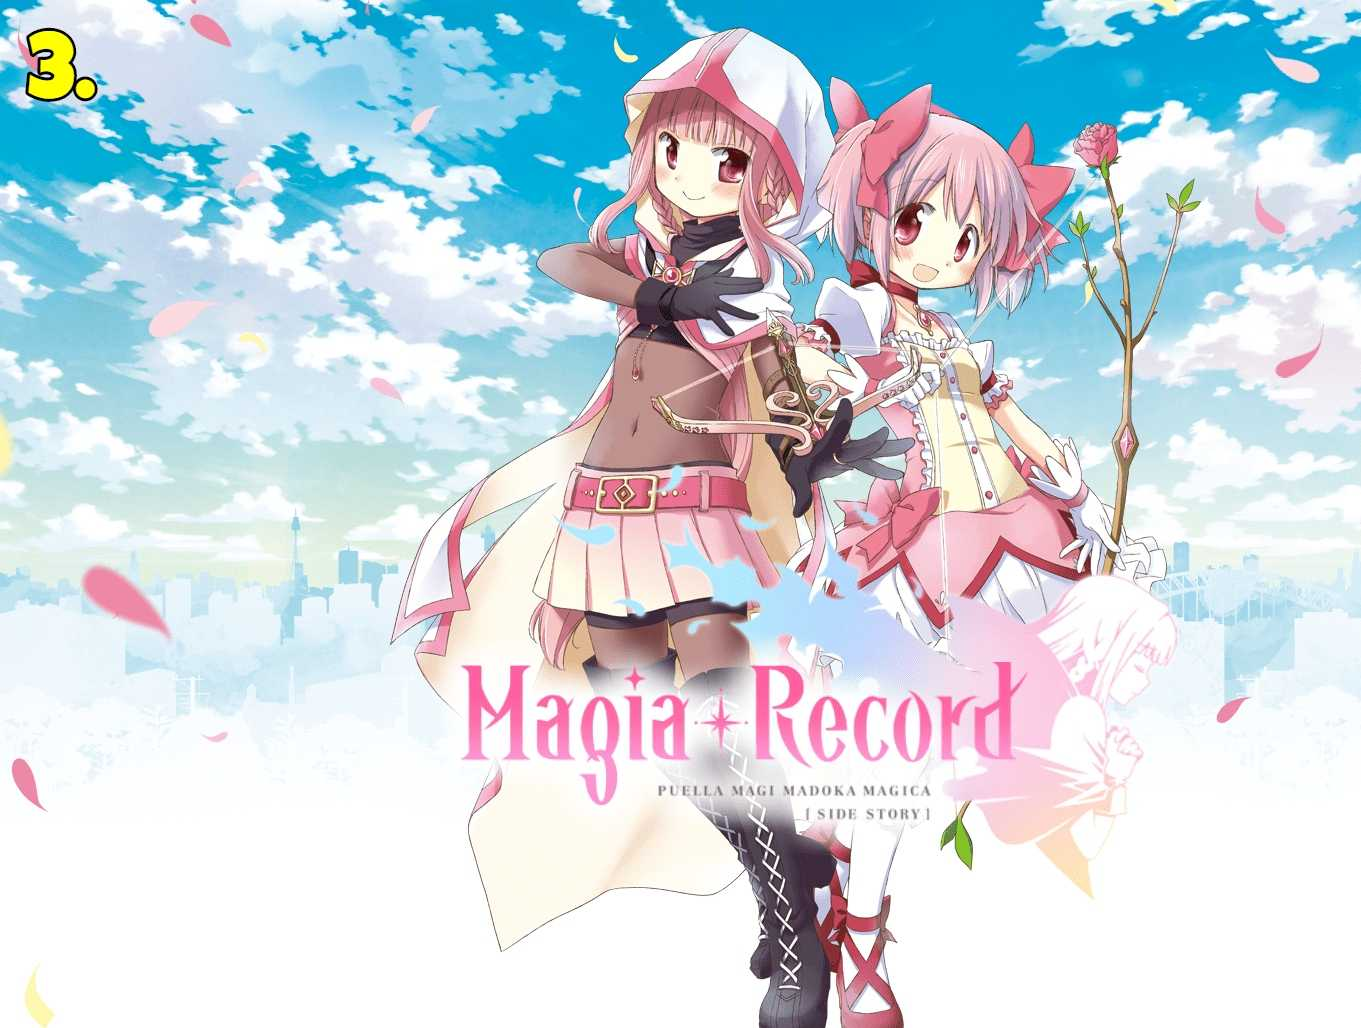 Puella-Magi-MadokaMagica-Side-Story-Magia-Record